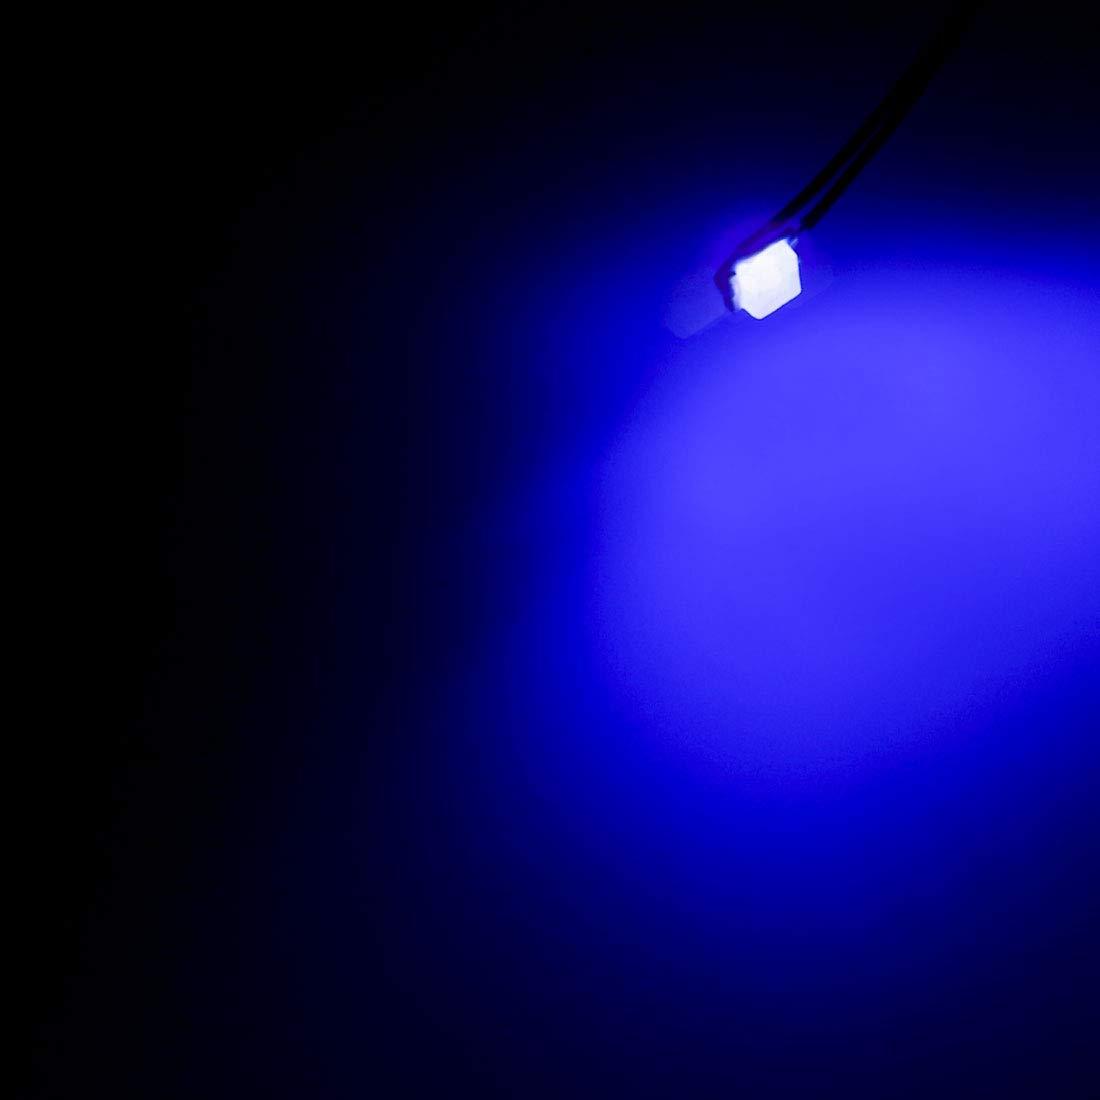 sourcing map 3pcs Prewired 0402 Blue SMD LED Light Emitting Diode DC 2.8-3V Micro Soldered Mini LED Light